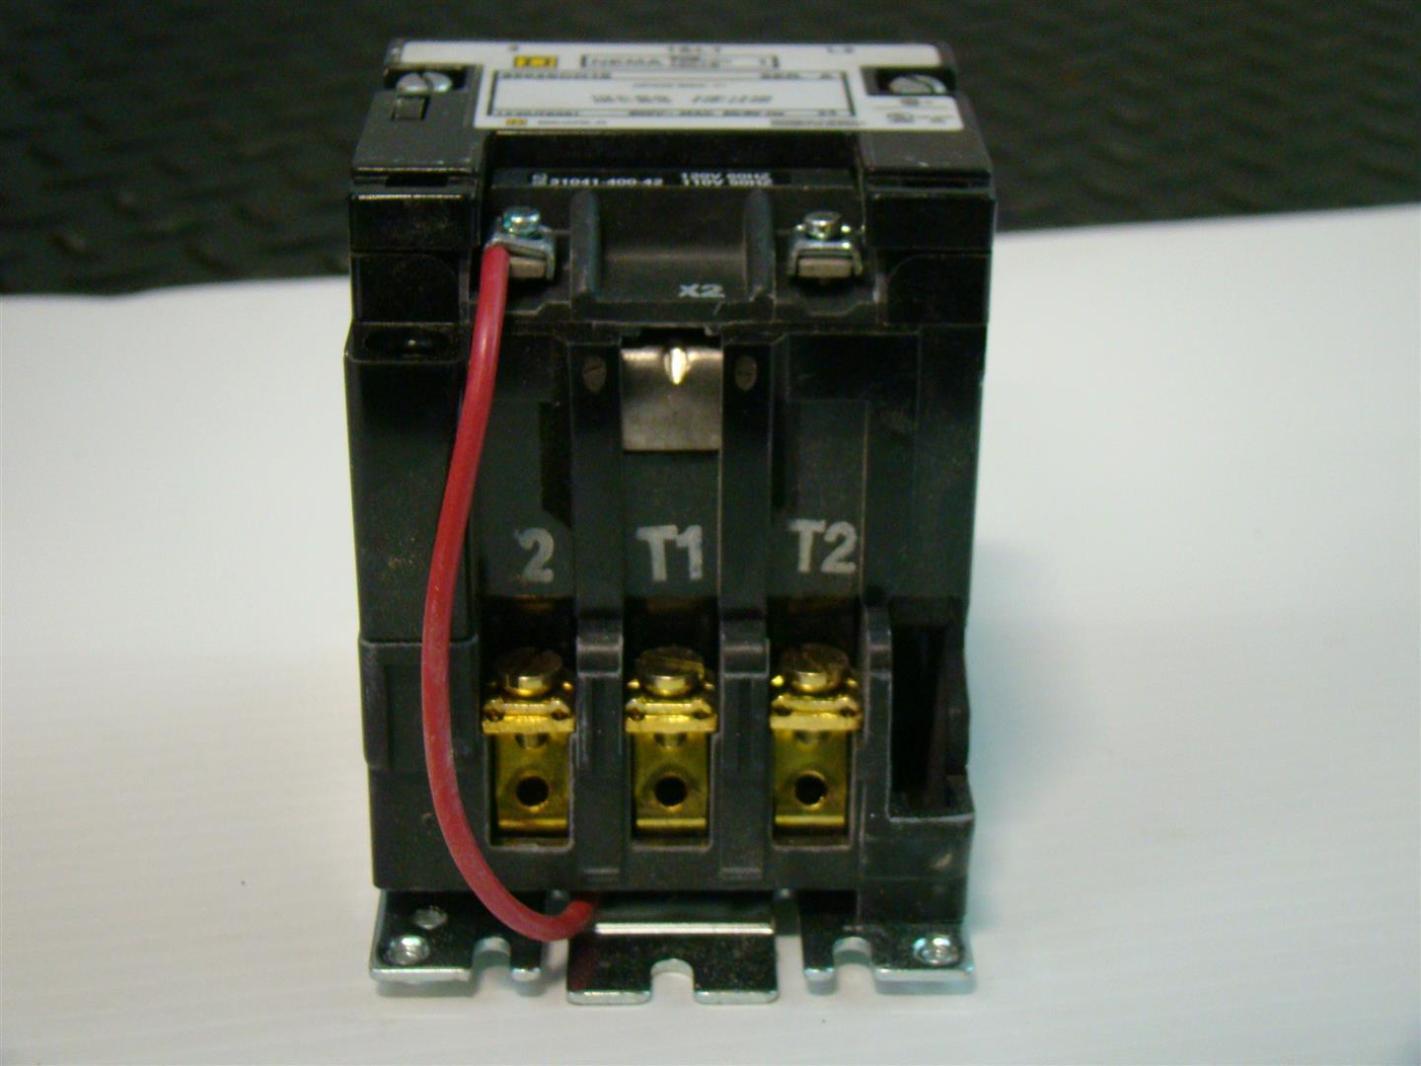 Control Wiring Diagram Of 3 Phase Motor : Motor starter wiring v coil real wiring diagram u